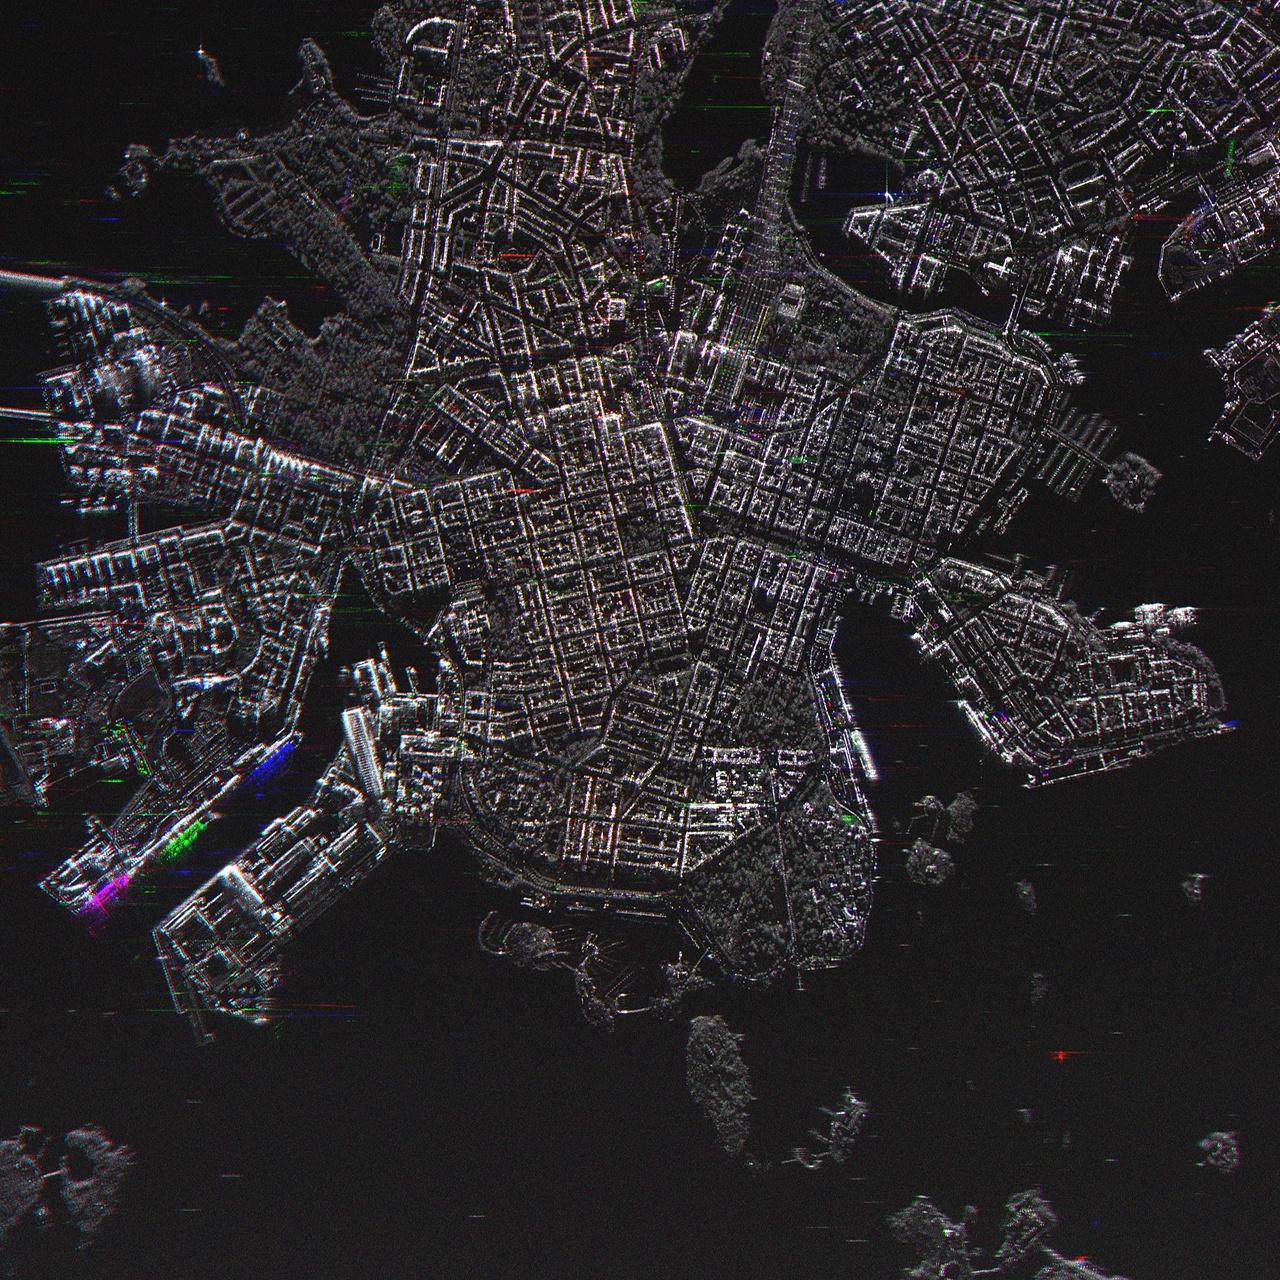 central-helsinki-change-detection-iceye-sar-data